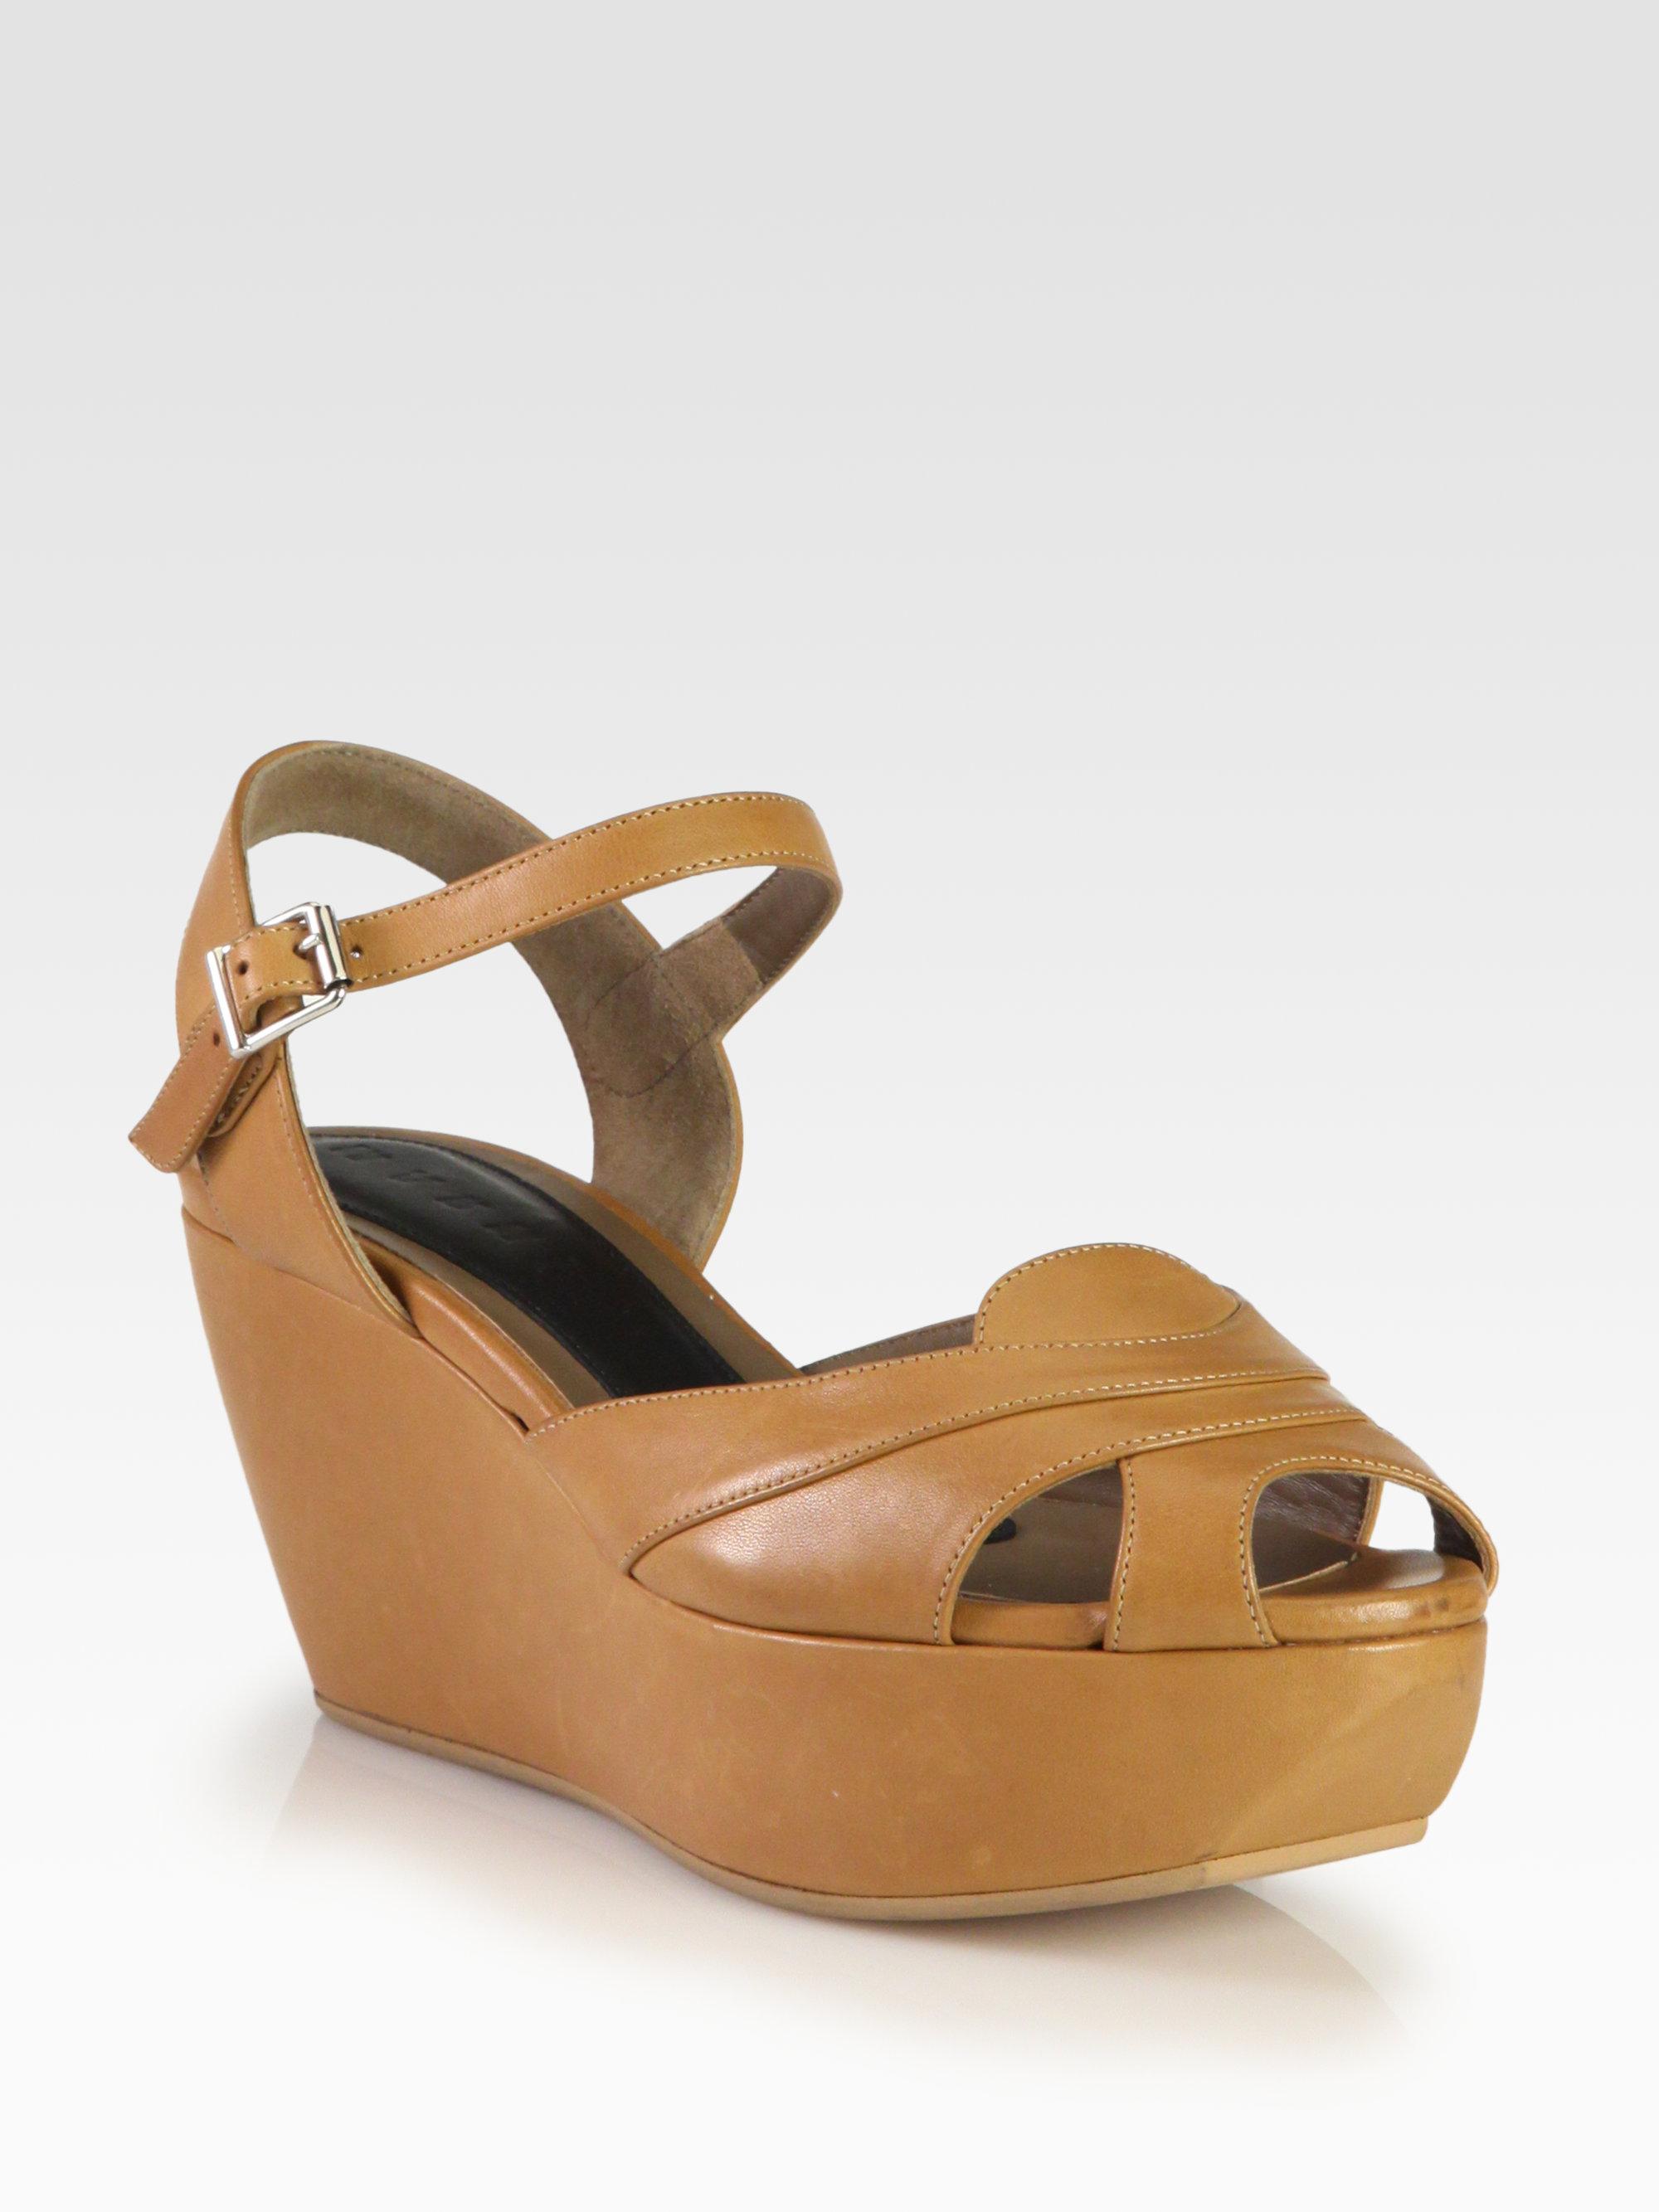 41f41ba3cf3 Lyst - Marni Leather Platform Wedge Sandals in Brown